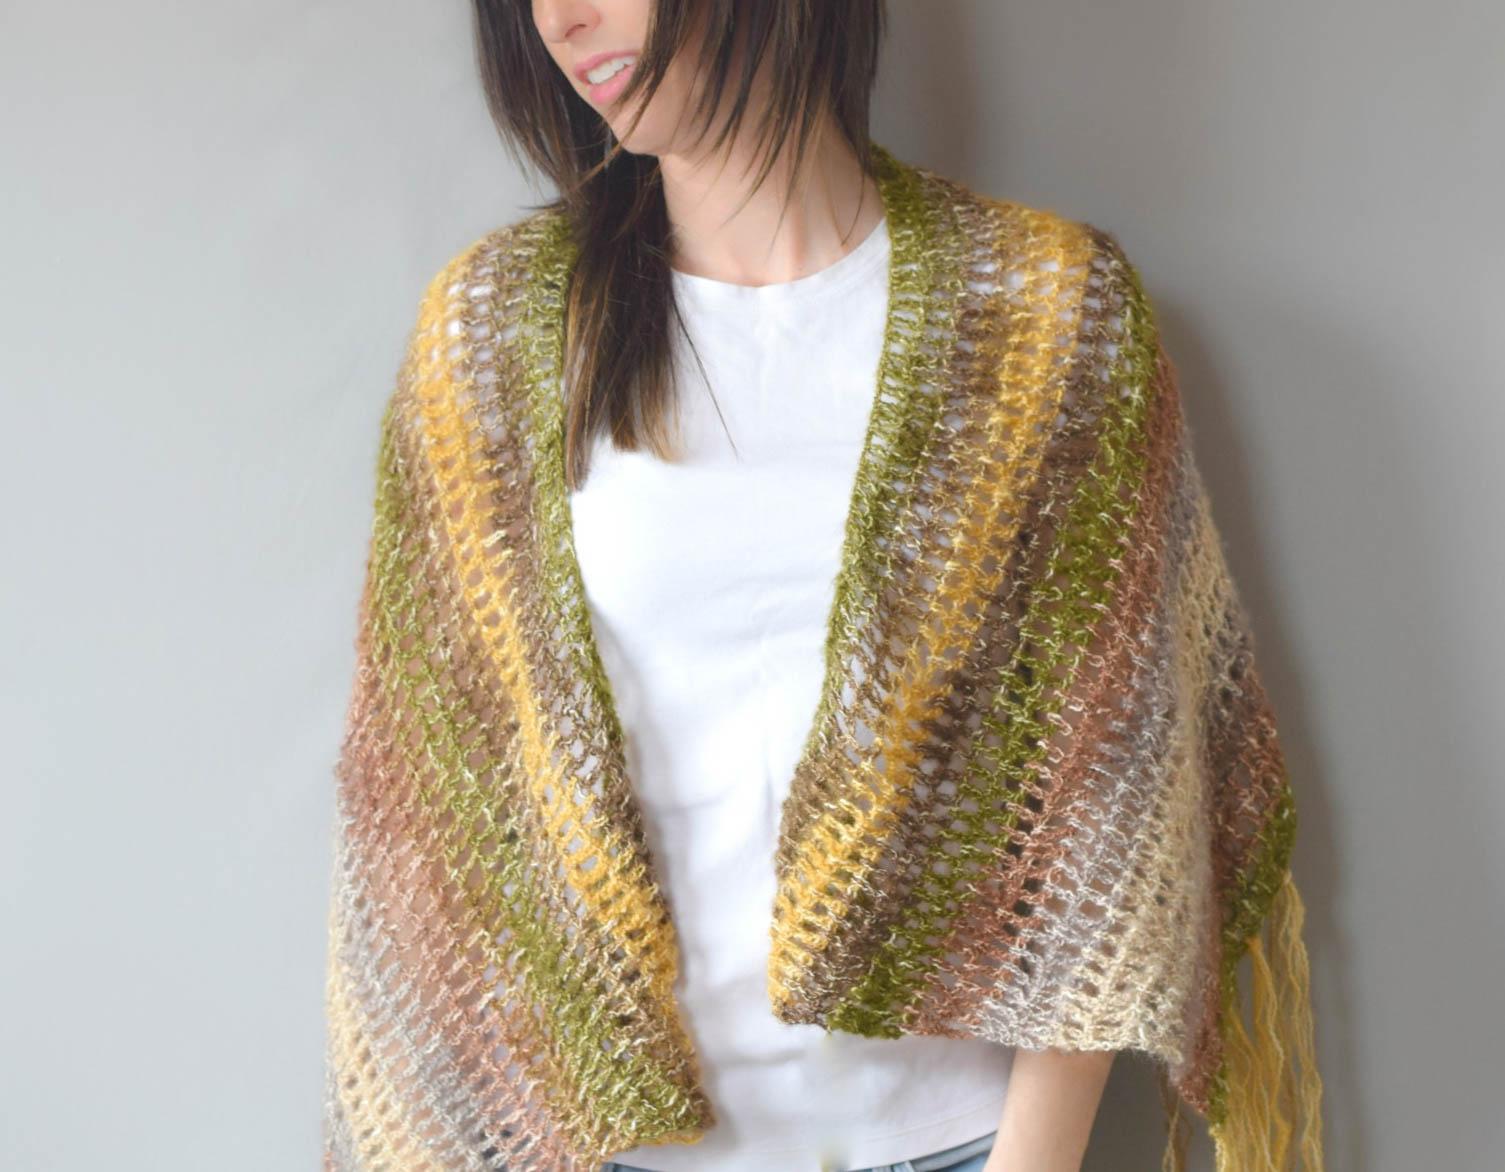 Crochet Pattern For Small Shawl : One Skein Crochet